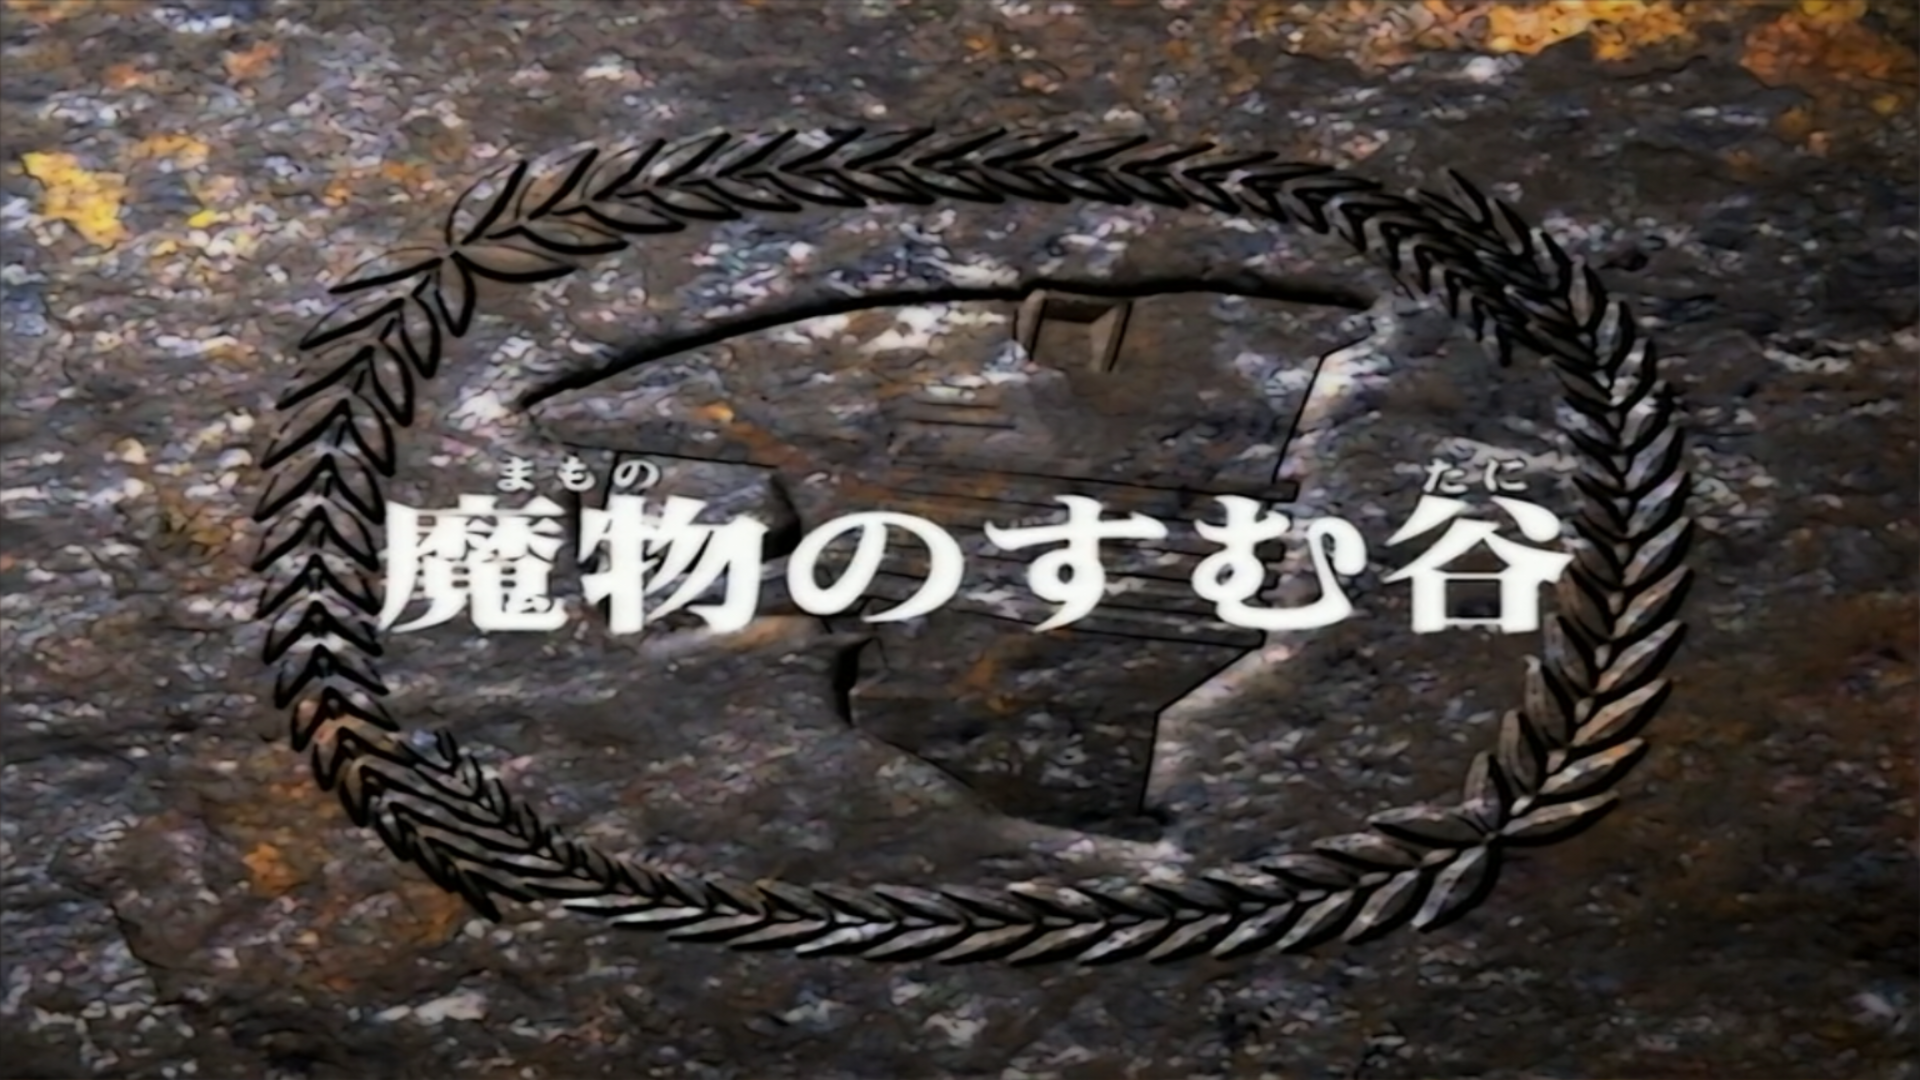 Zoids: Chaotic Century Episode 9